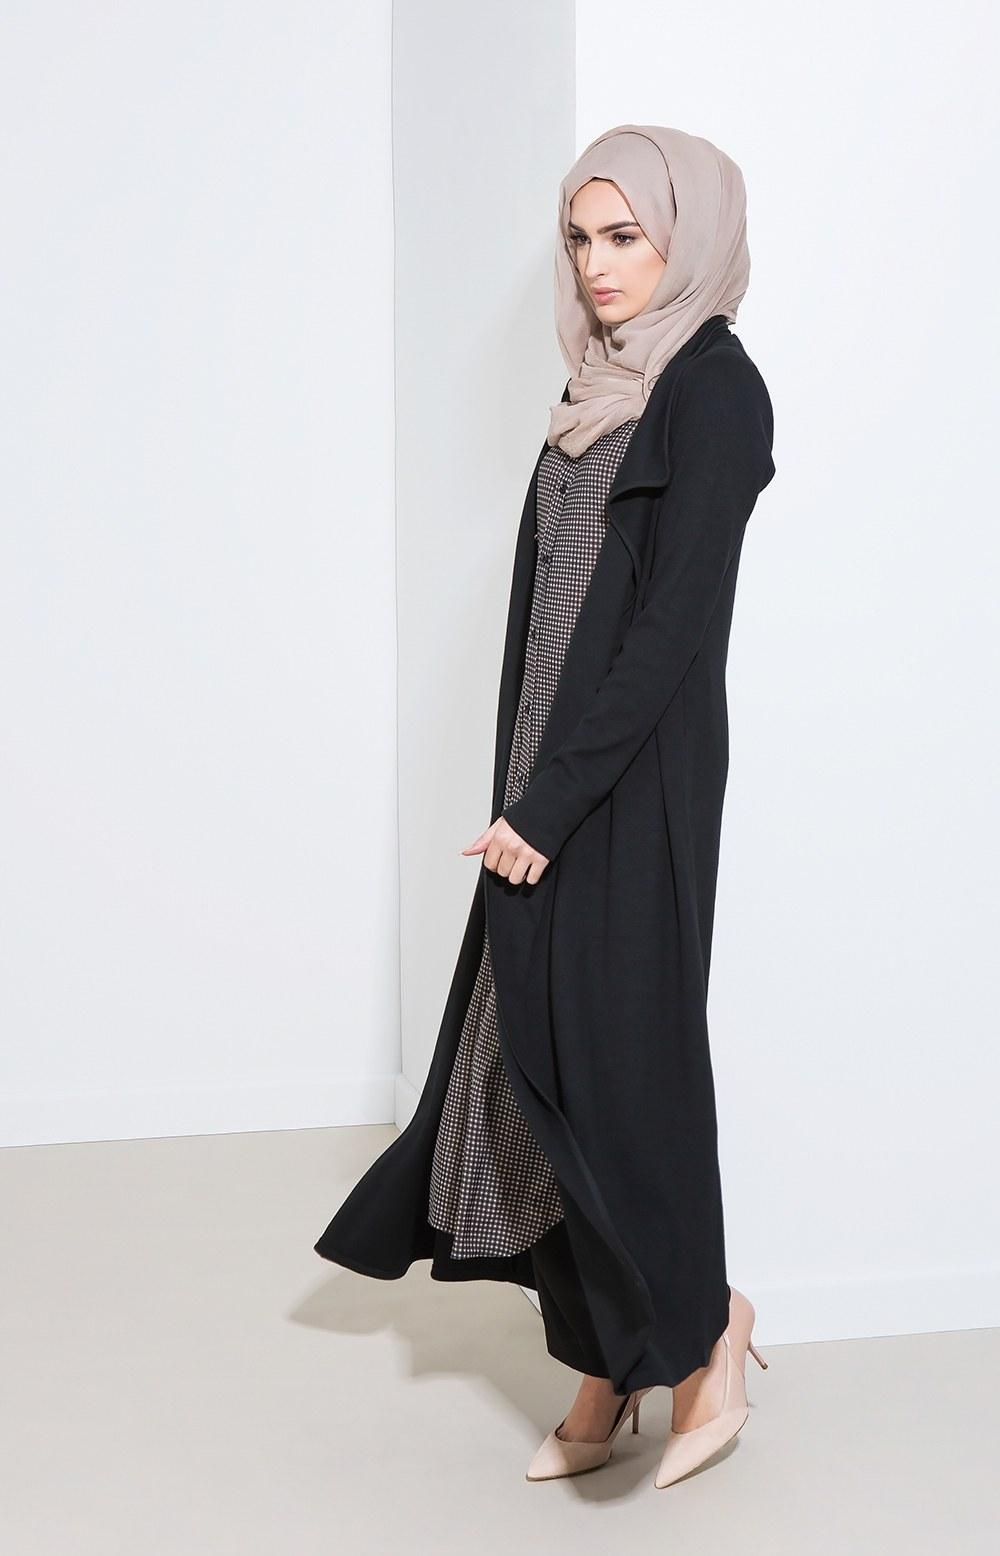 Model Baju Lebaran Modis 3ldq 25 Trend Model Baju Muslim Lebaran 2018 Simple & Modis